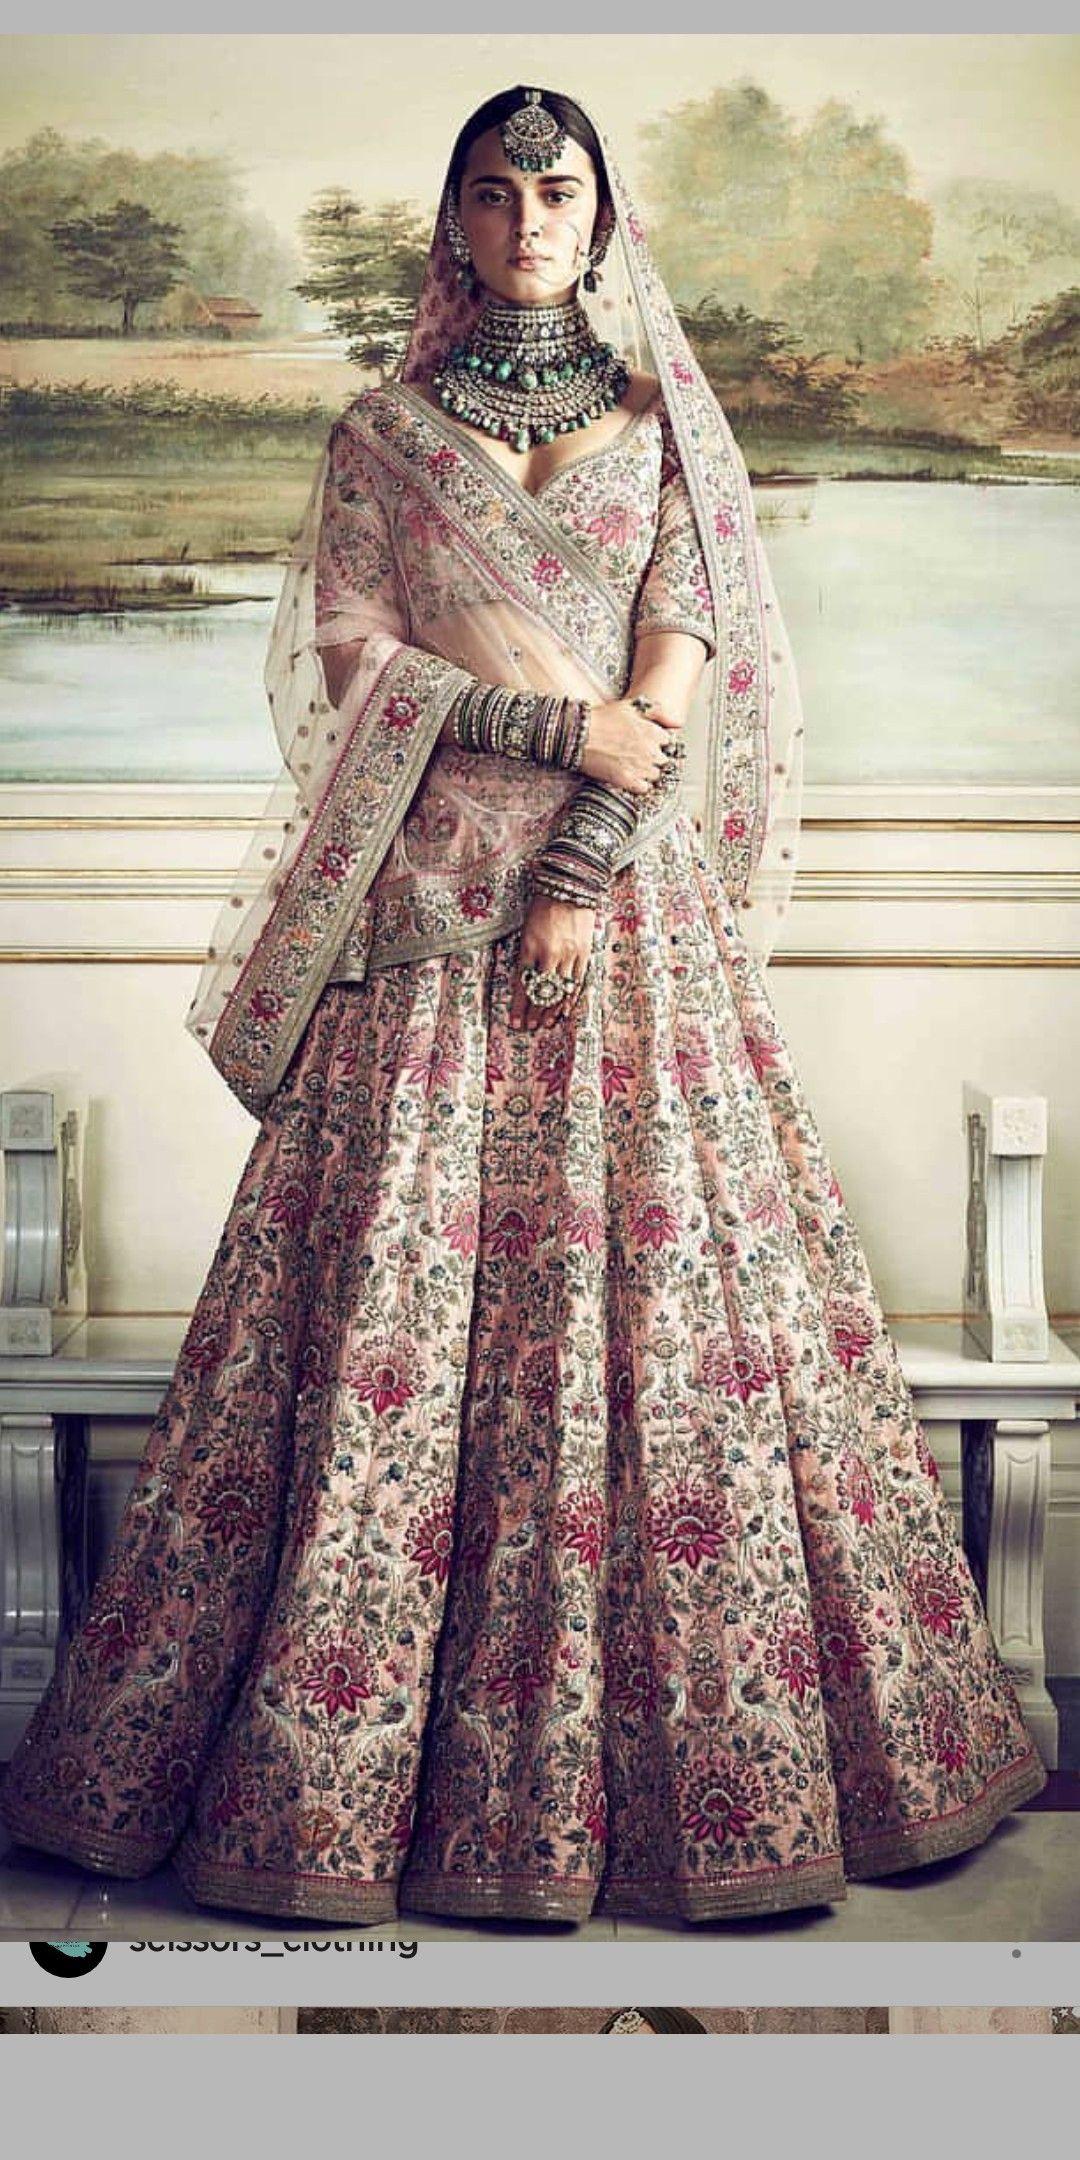 28c723acac Dress worn by Anushka Sharma Kohli on her wedding with Virat Kohli ...